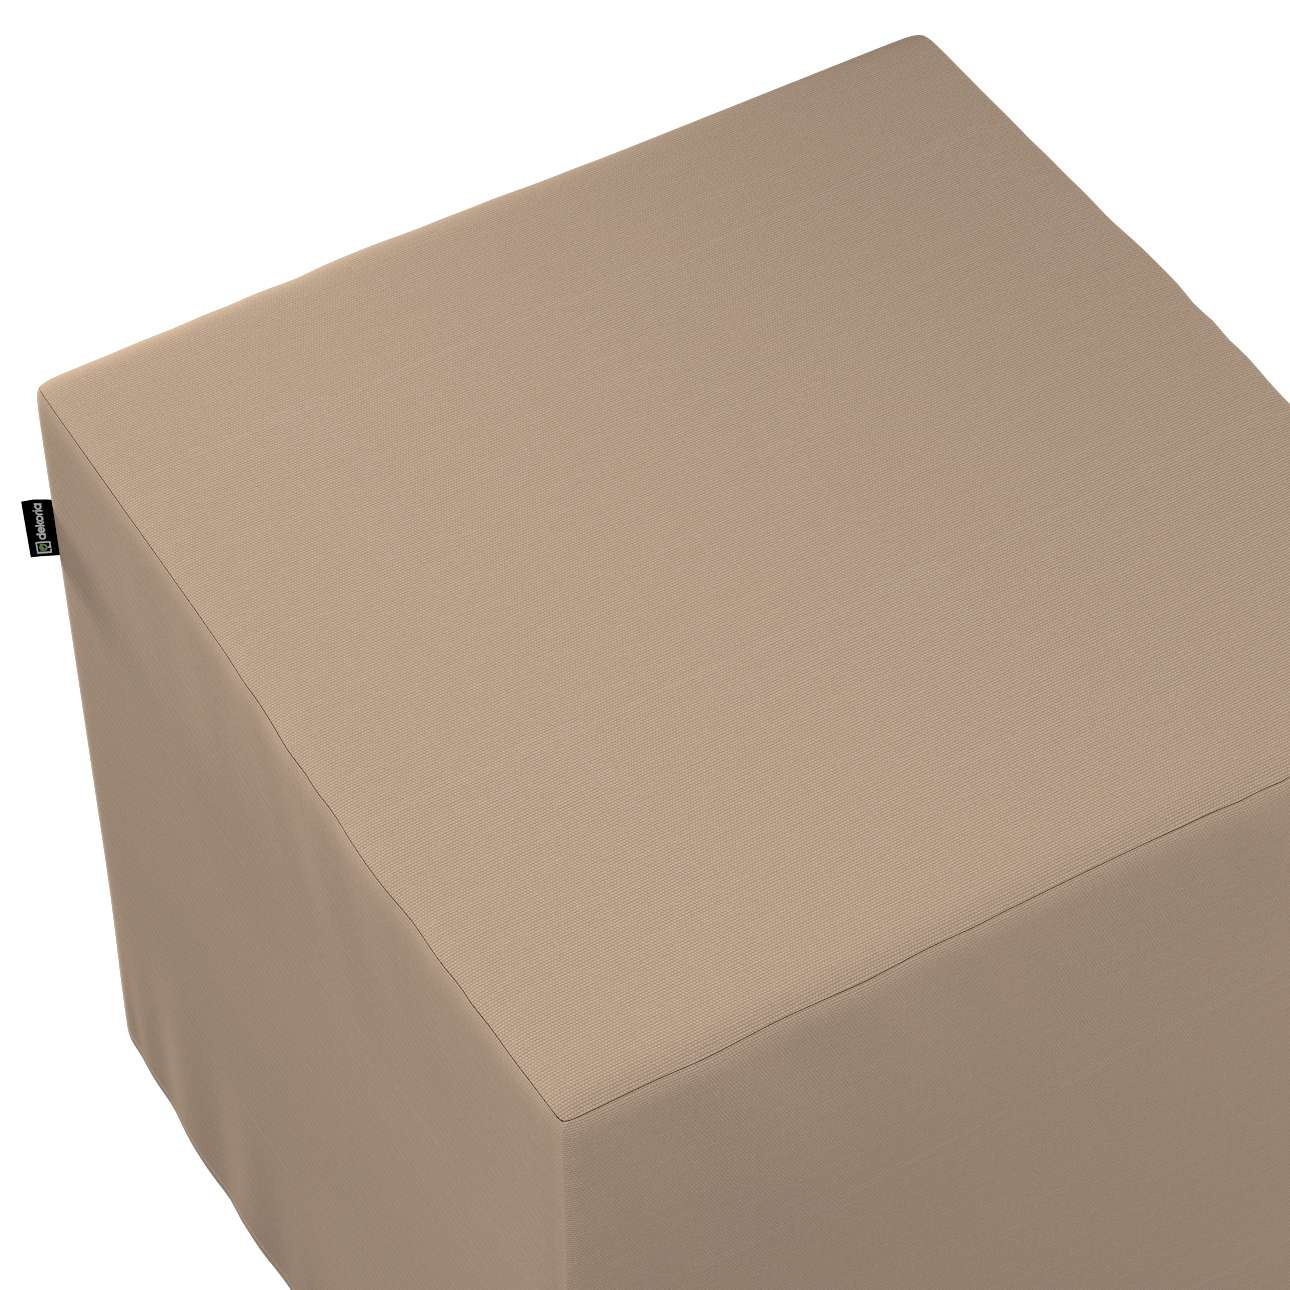 Taburetka tvrdá, kocka V kolekcii Cotton Panama, tkanina: 702-28